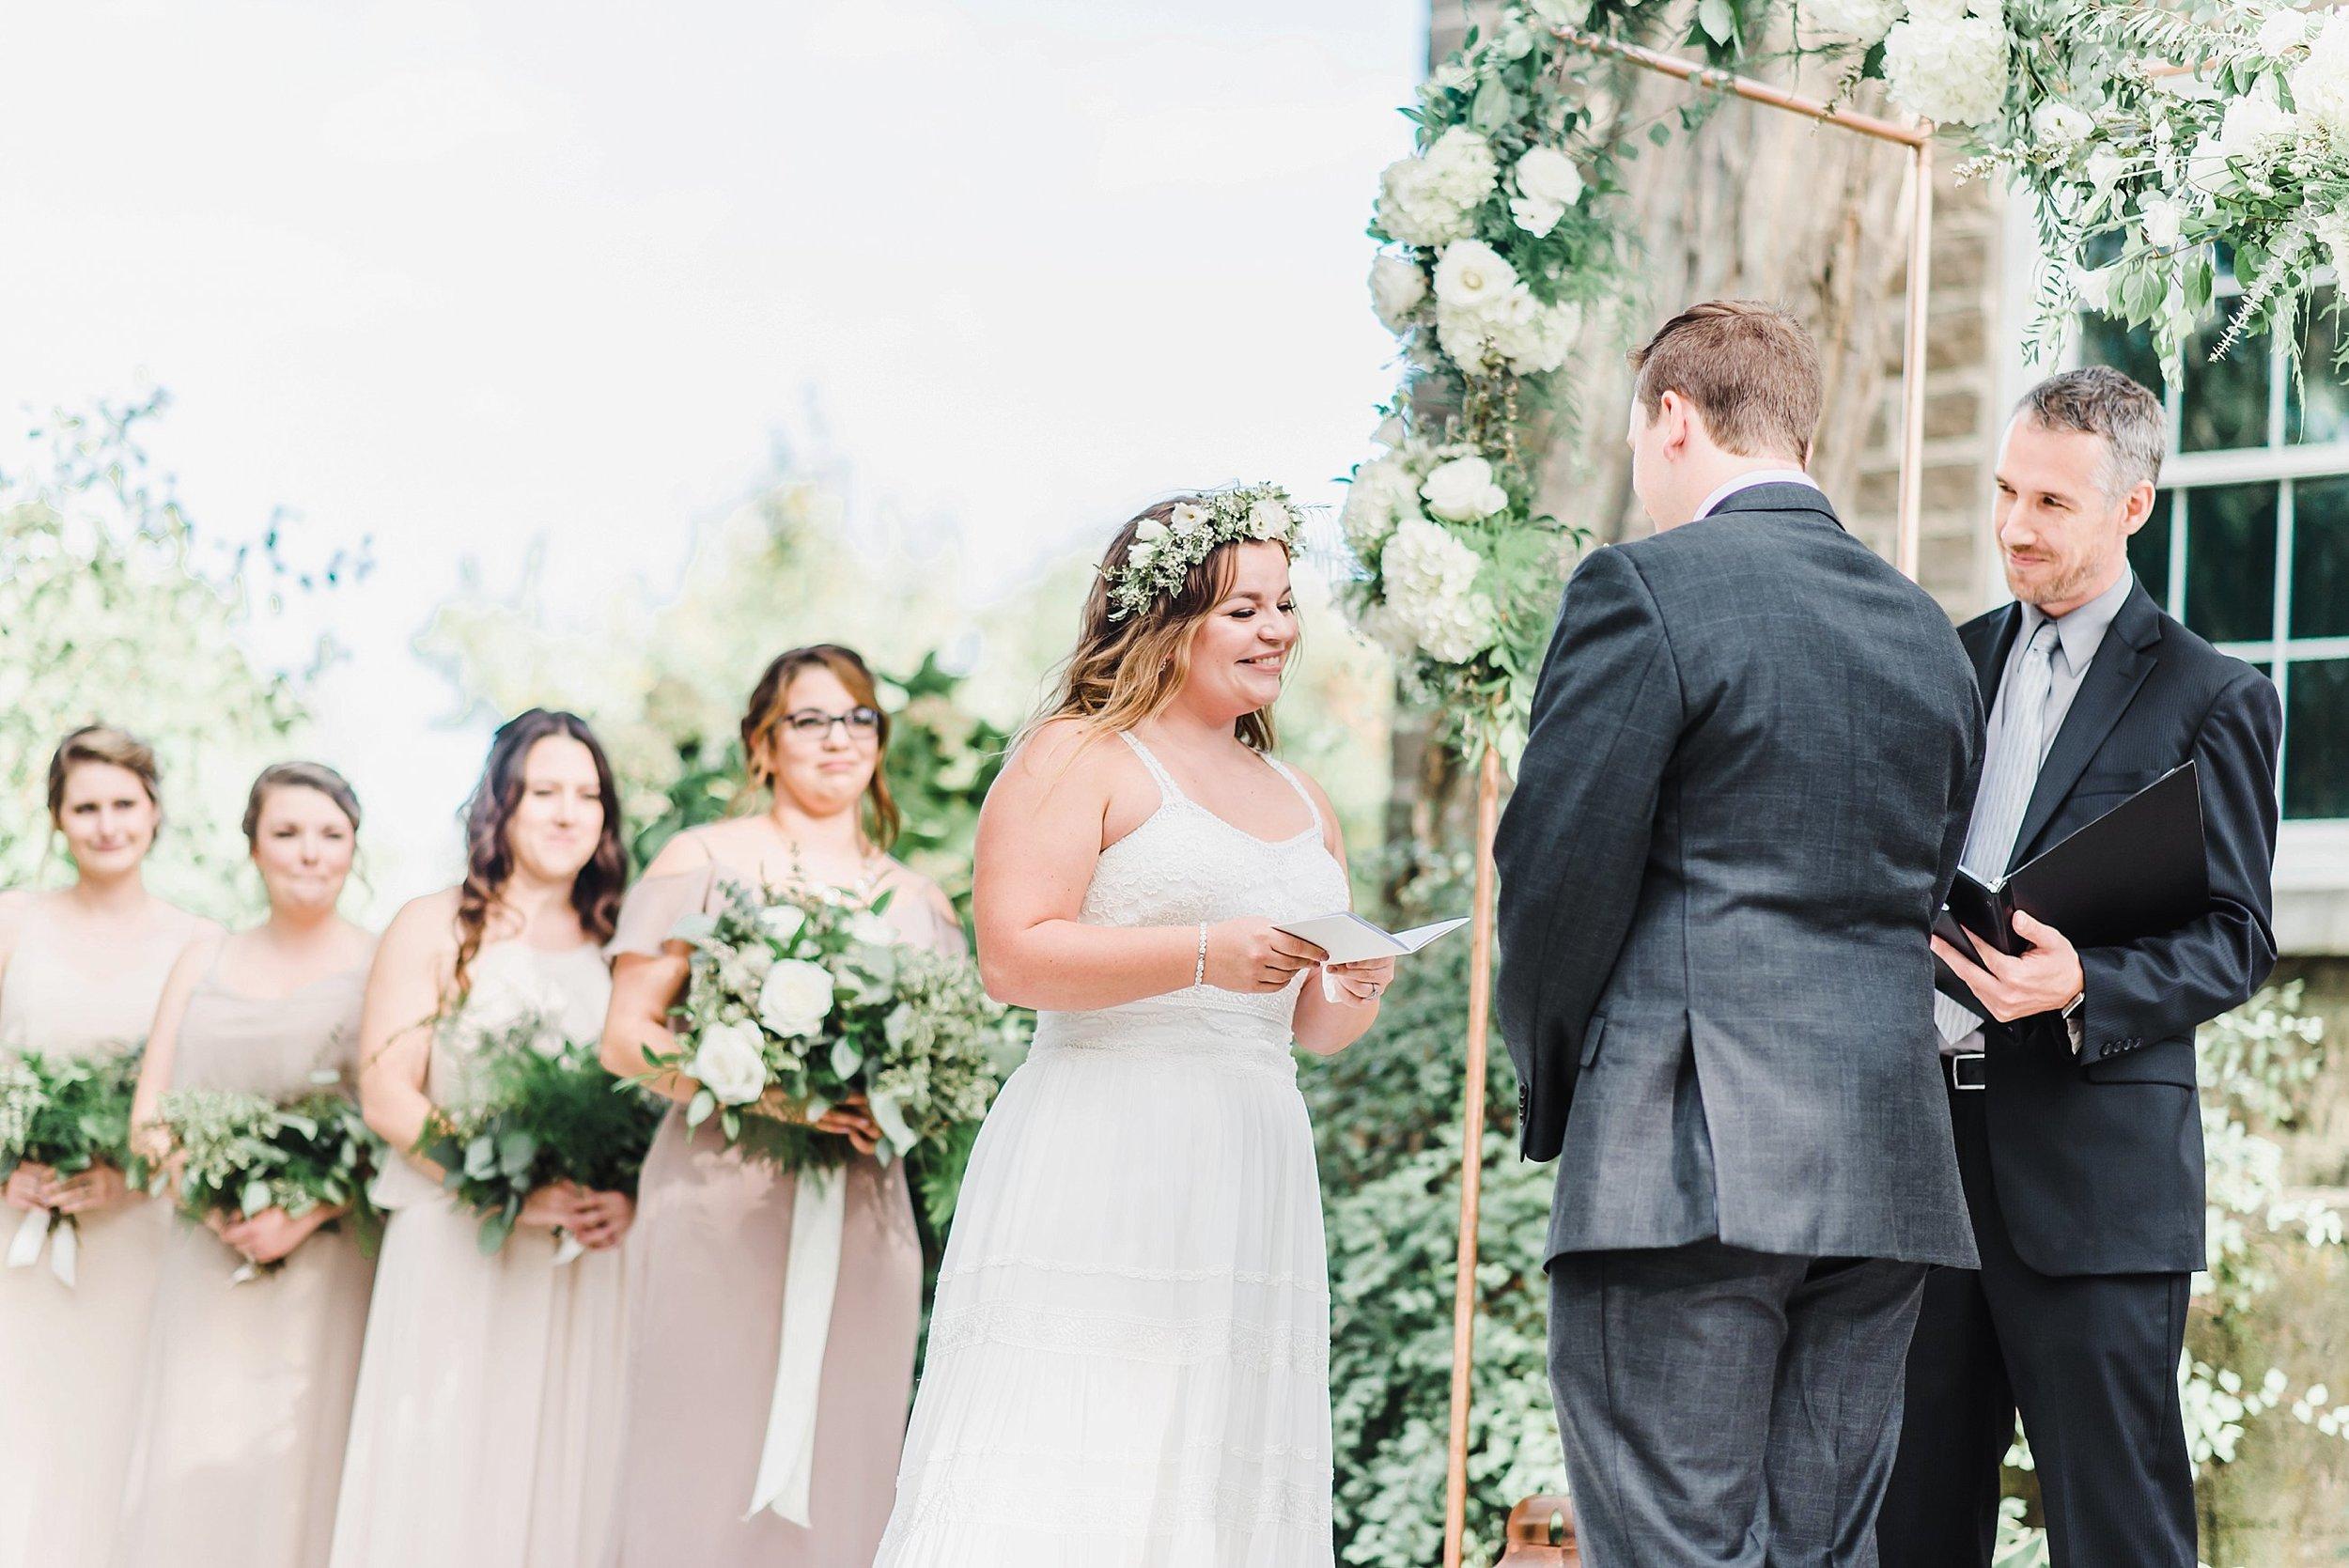 light airy indie fine art ottawa wedding photographer | Ali and Batoul Photography_1152.jpg